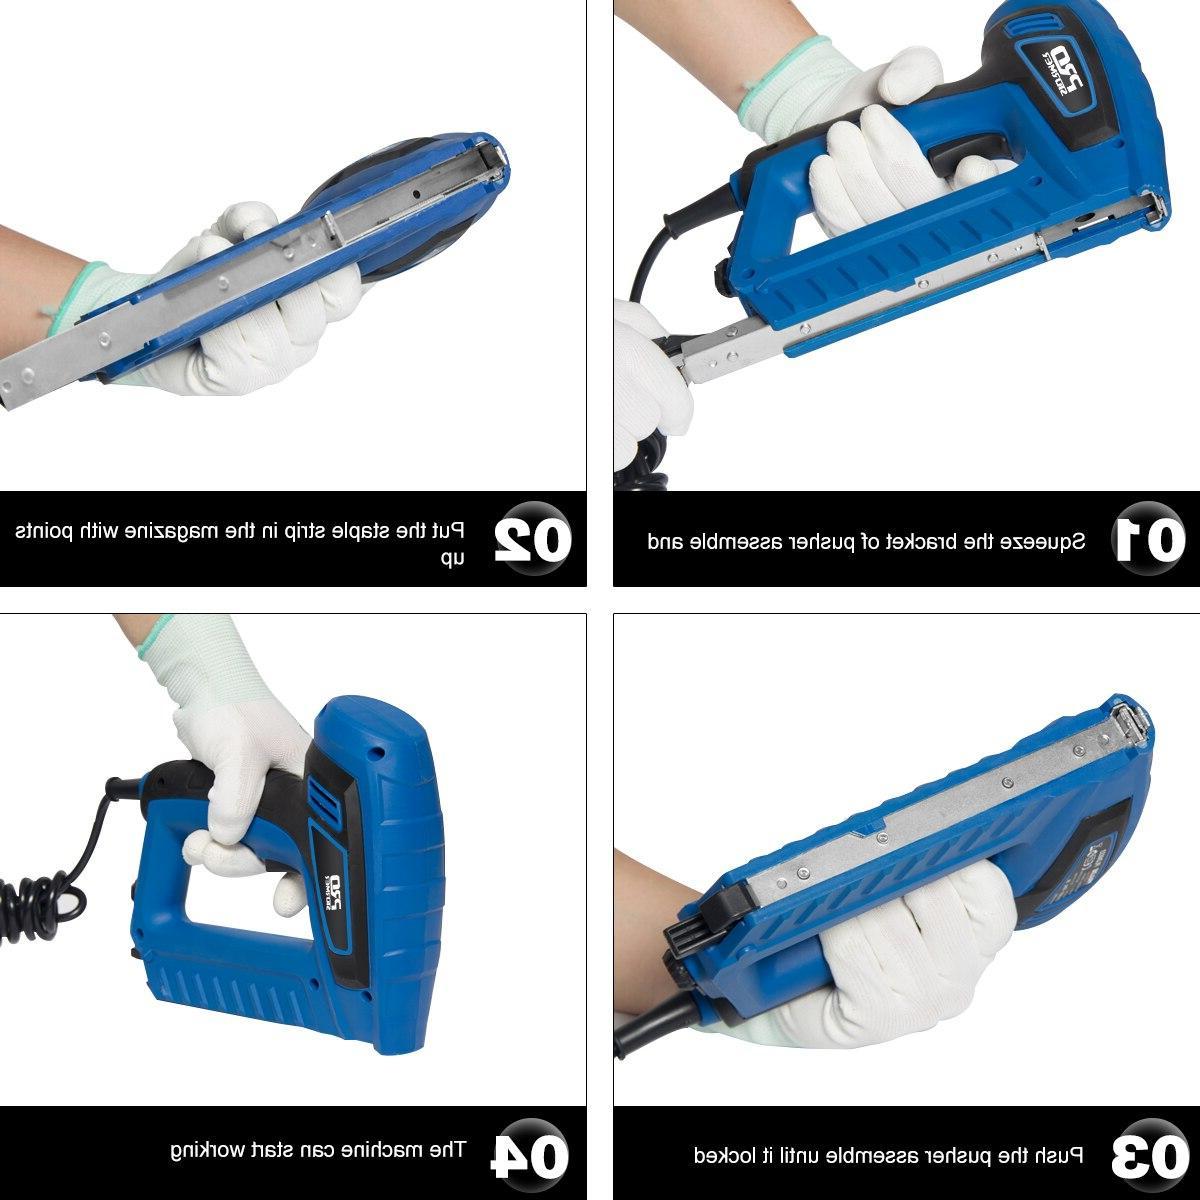 PROSTORMER 2000W Adjustable Upholstery